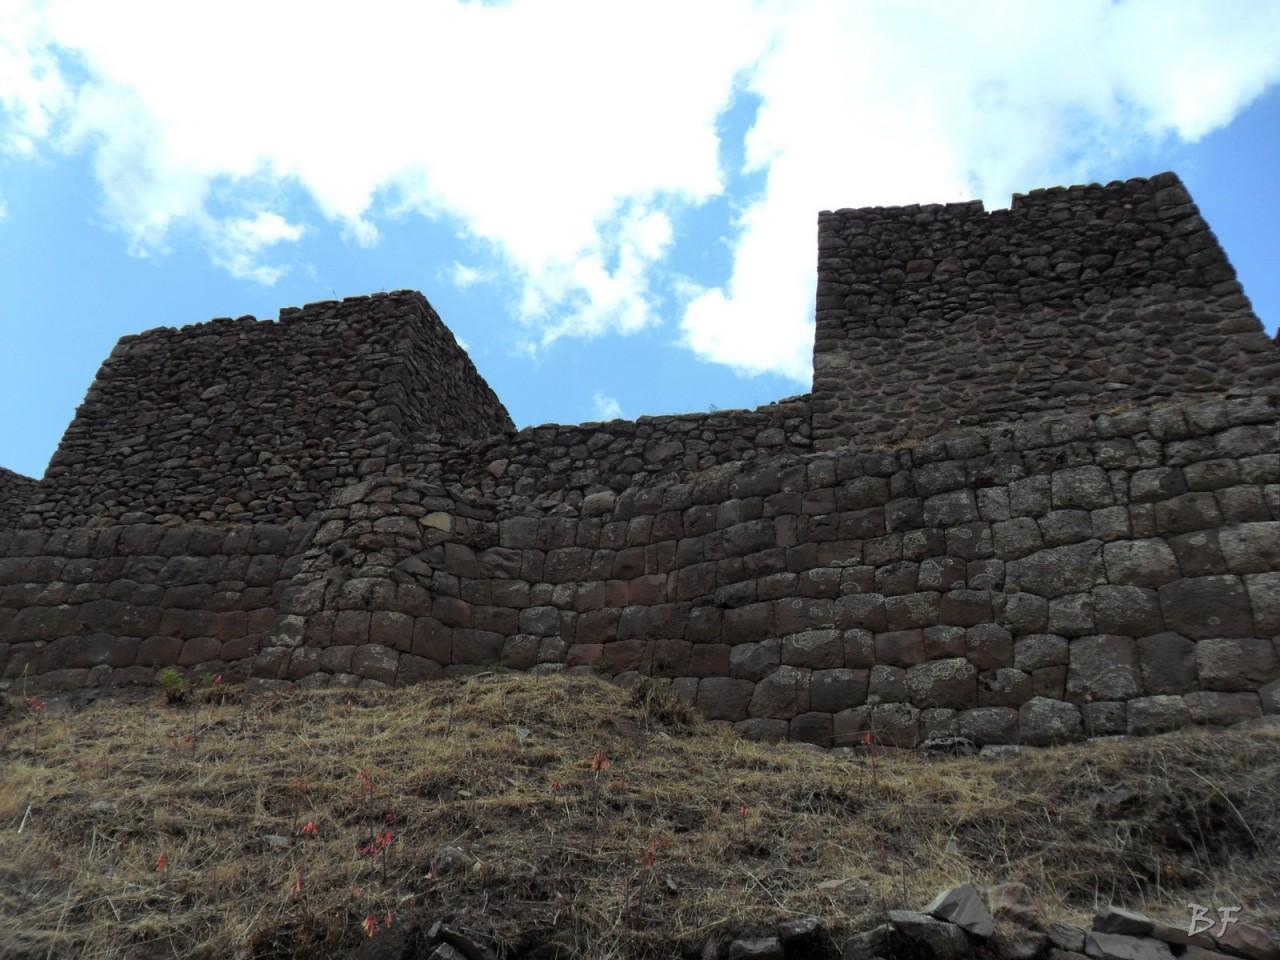 Mura-Poligonali-Megaliti-Altari-Rupestri-Pisac-Cusco-Perù-14